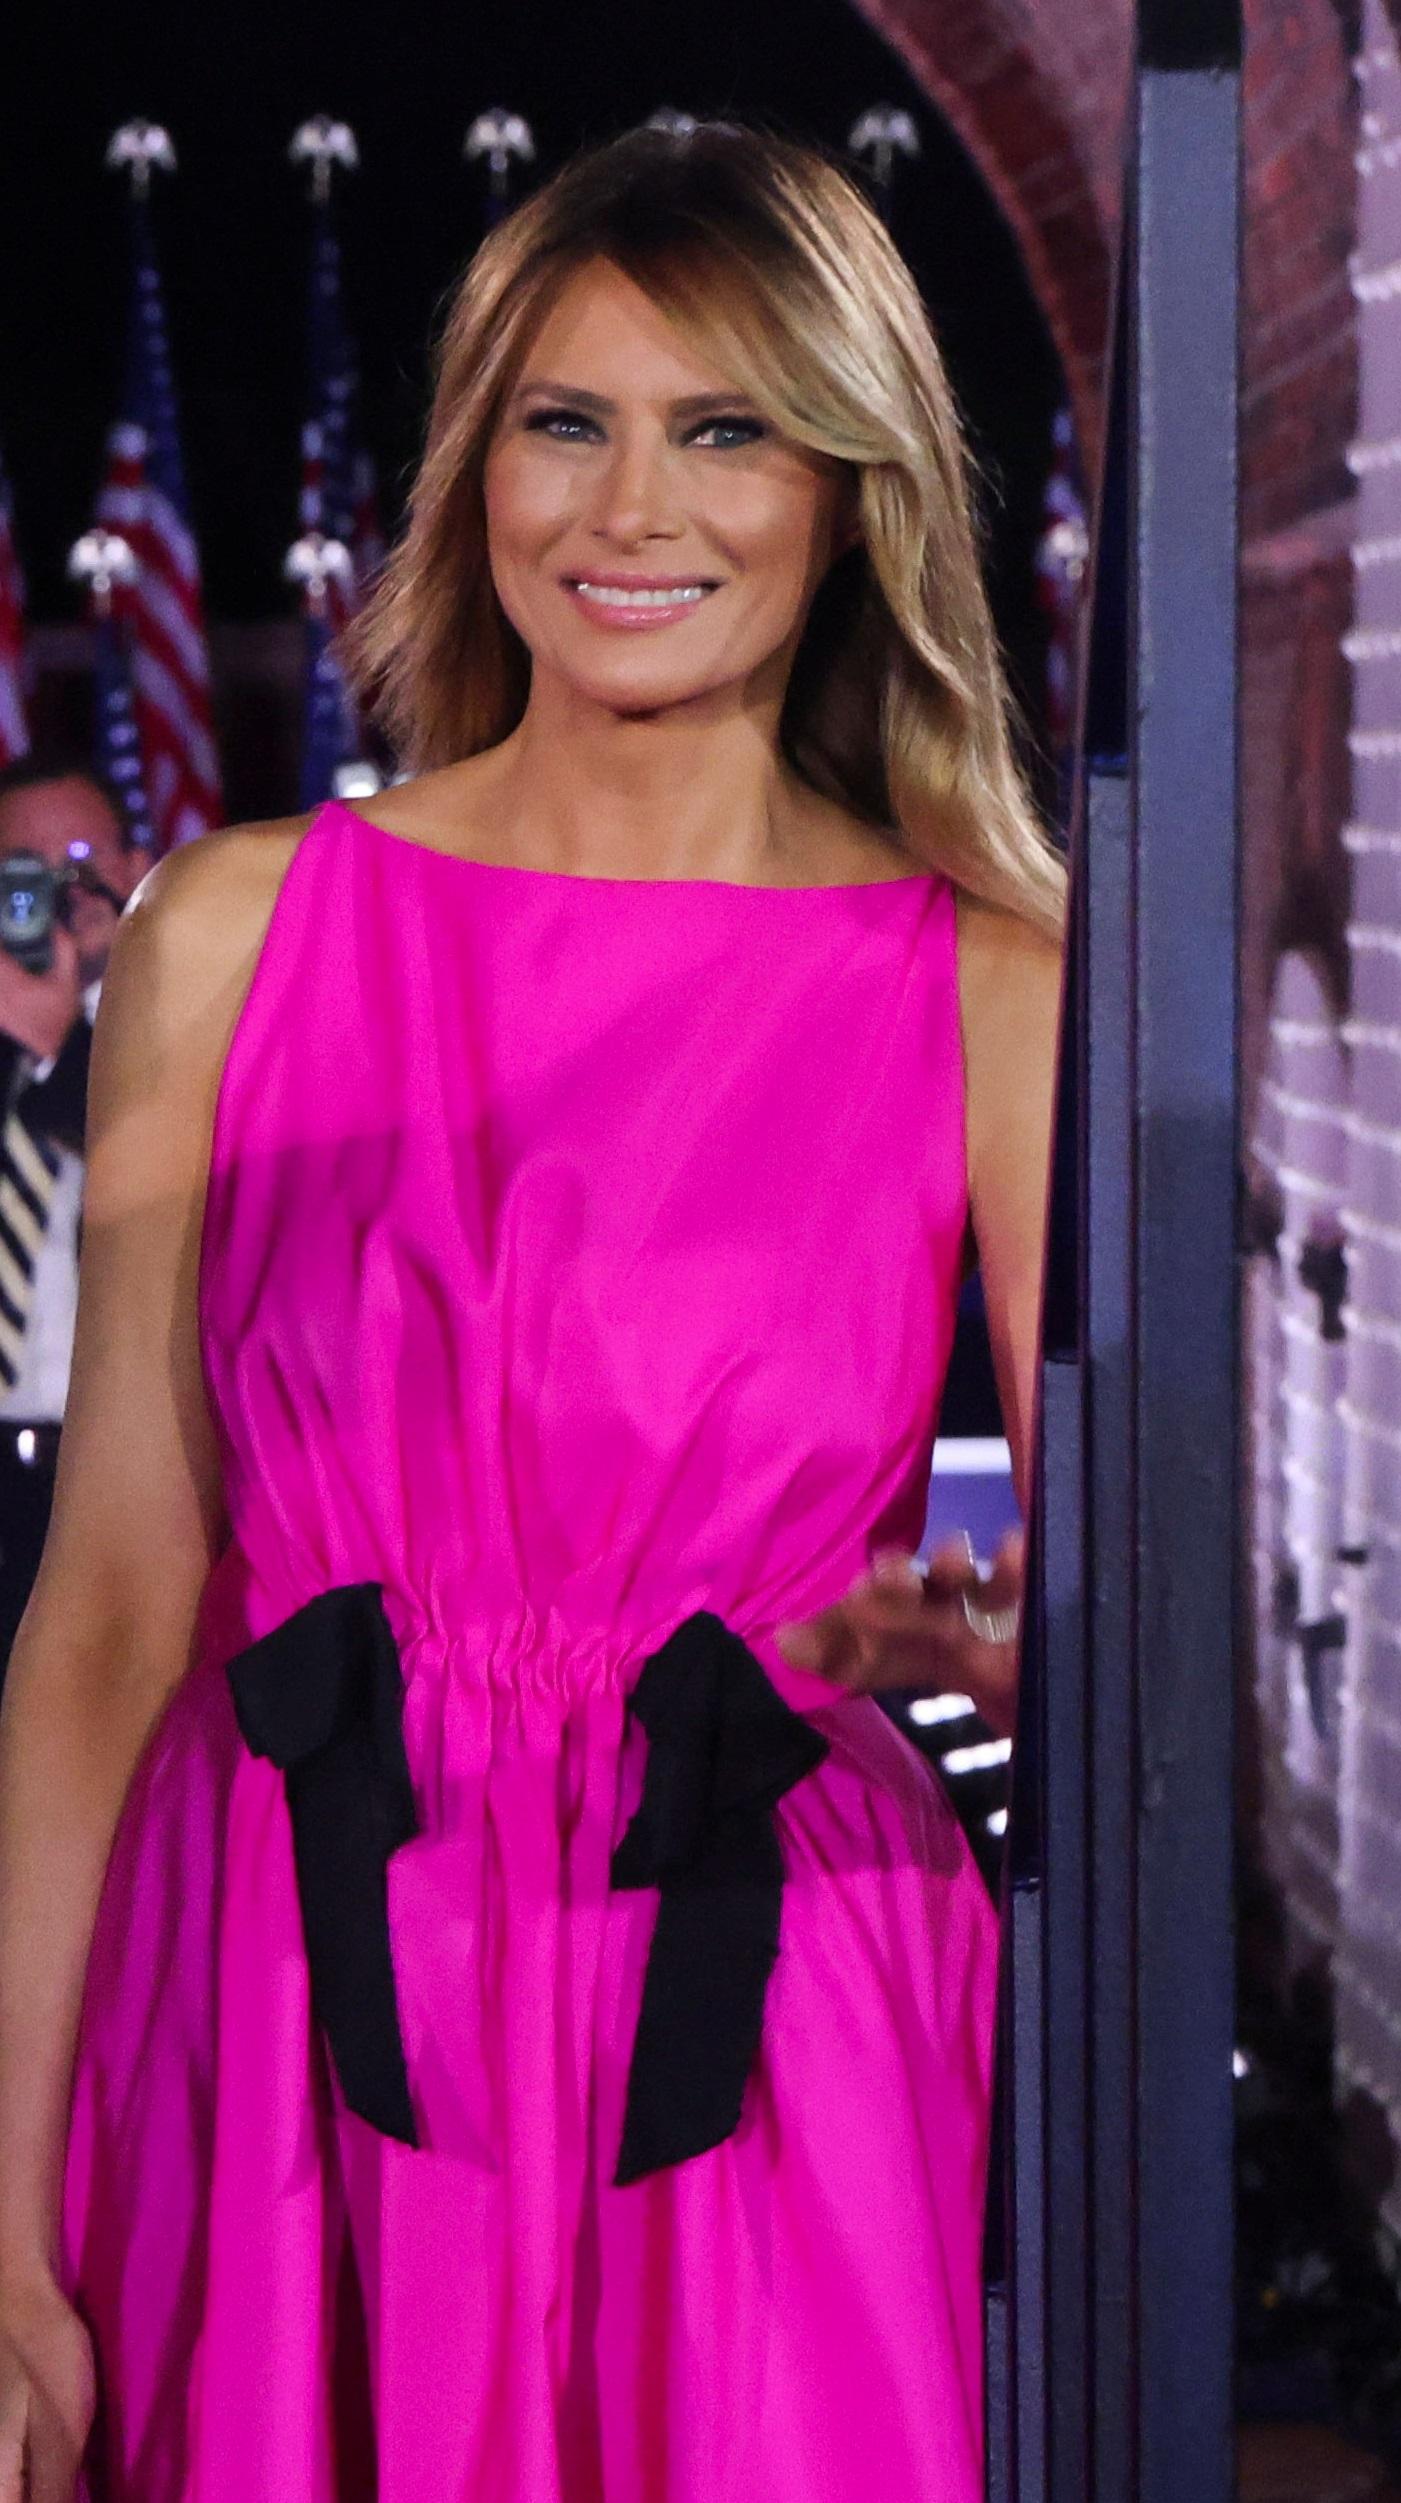 Melania Trump w różowej sukience. Fot. JONATHAN ERNST / Reuters / Forum